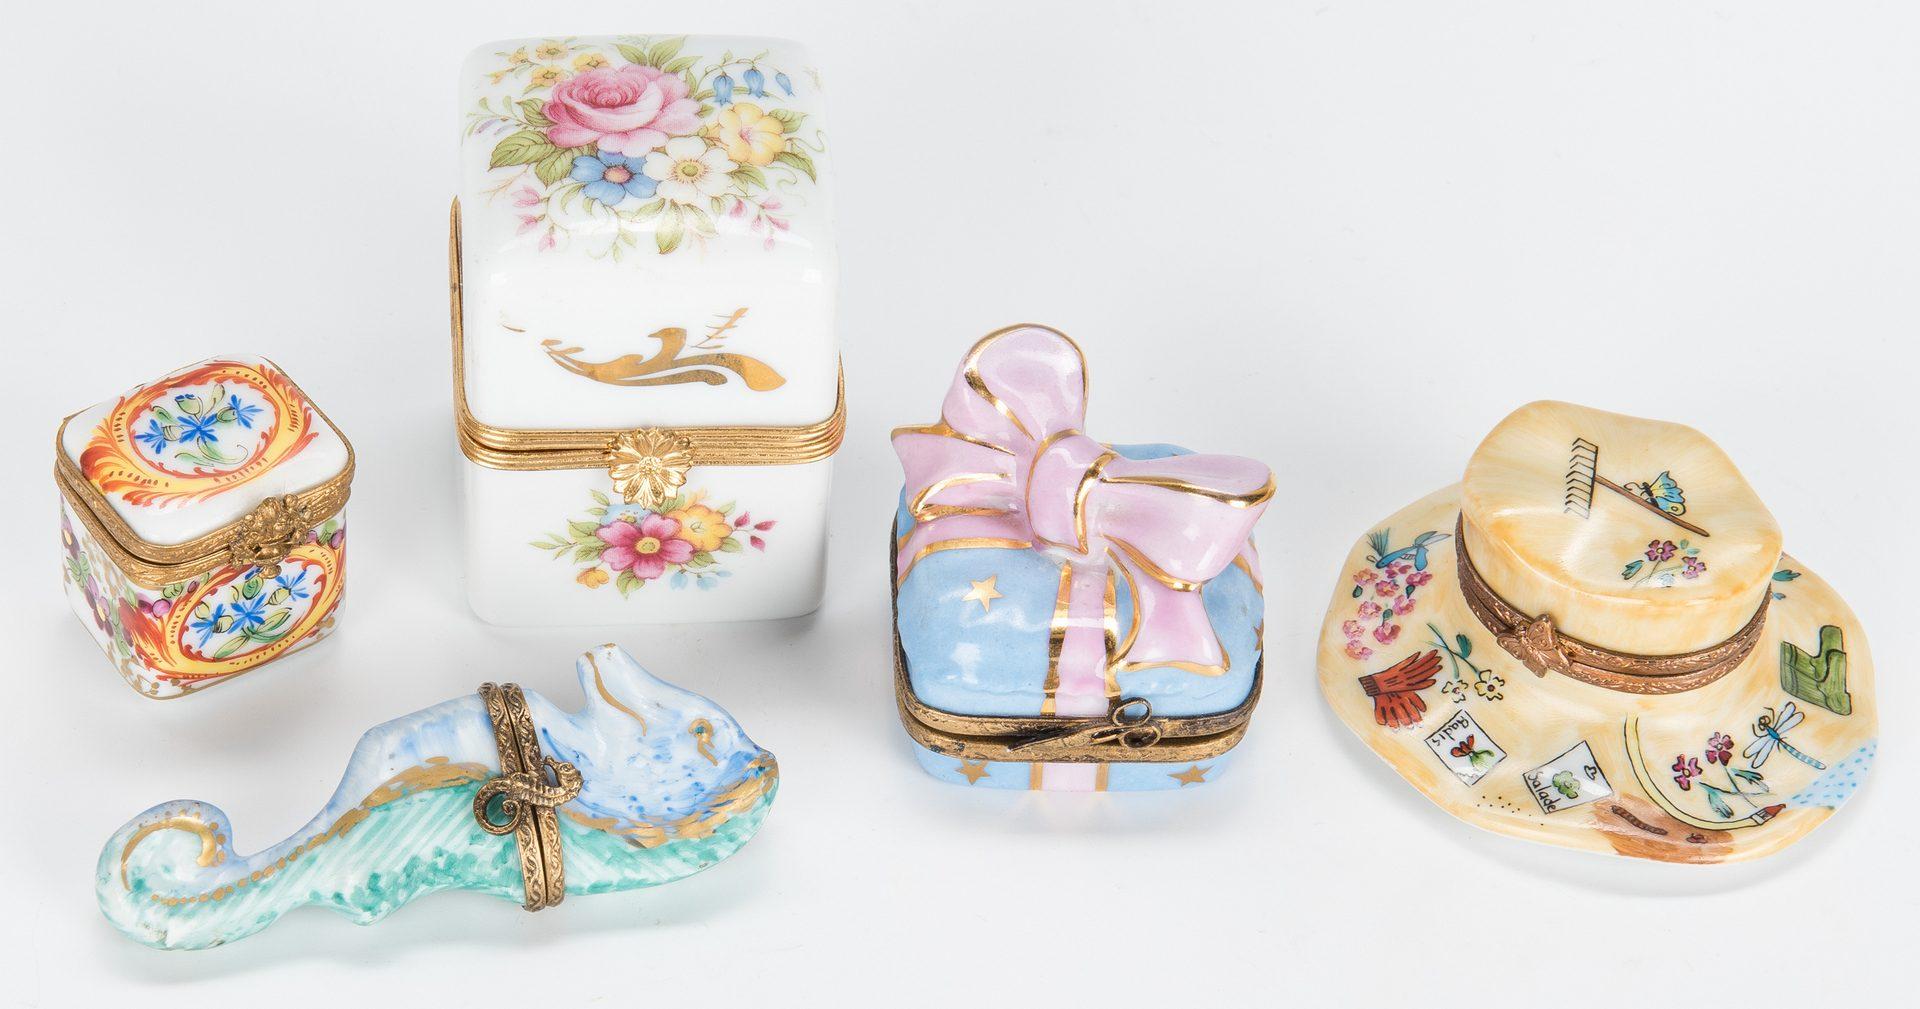 Lot 333: 21 Assorted American & European Porcelain Items